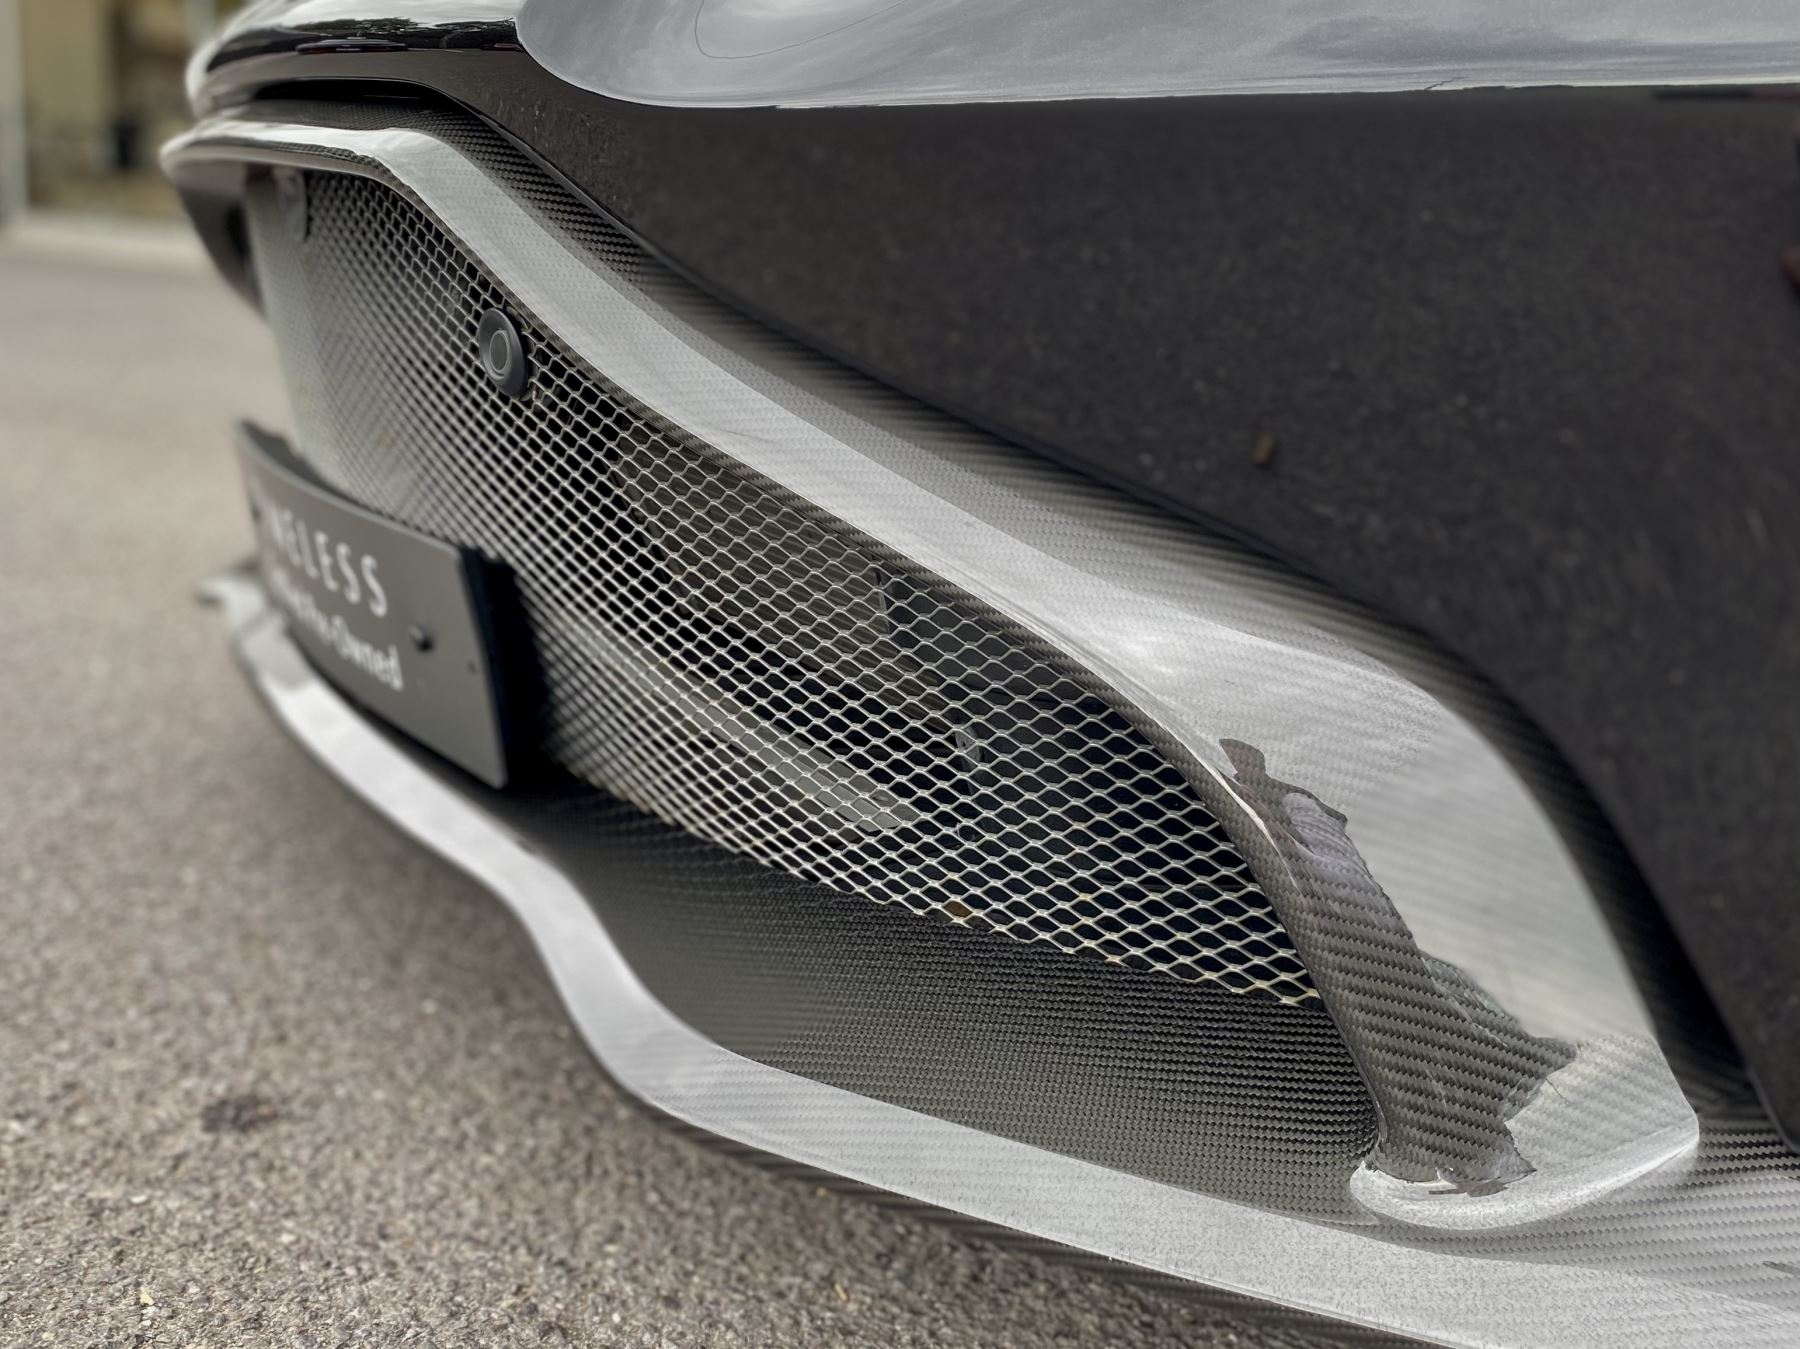 Aston Martin New Vantage 2dr ZF 8 Speed Auto. 4.0 Twin Turbo ZF Gearbox  Reversing Camera Heated Seats Ceramic Brakes image 18